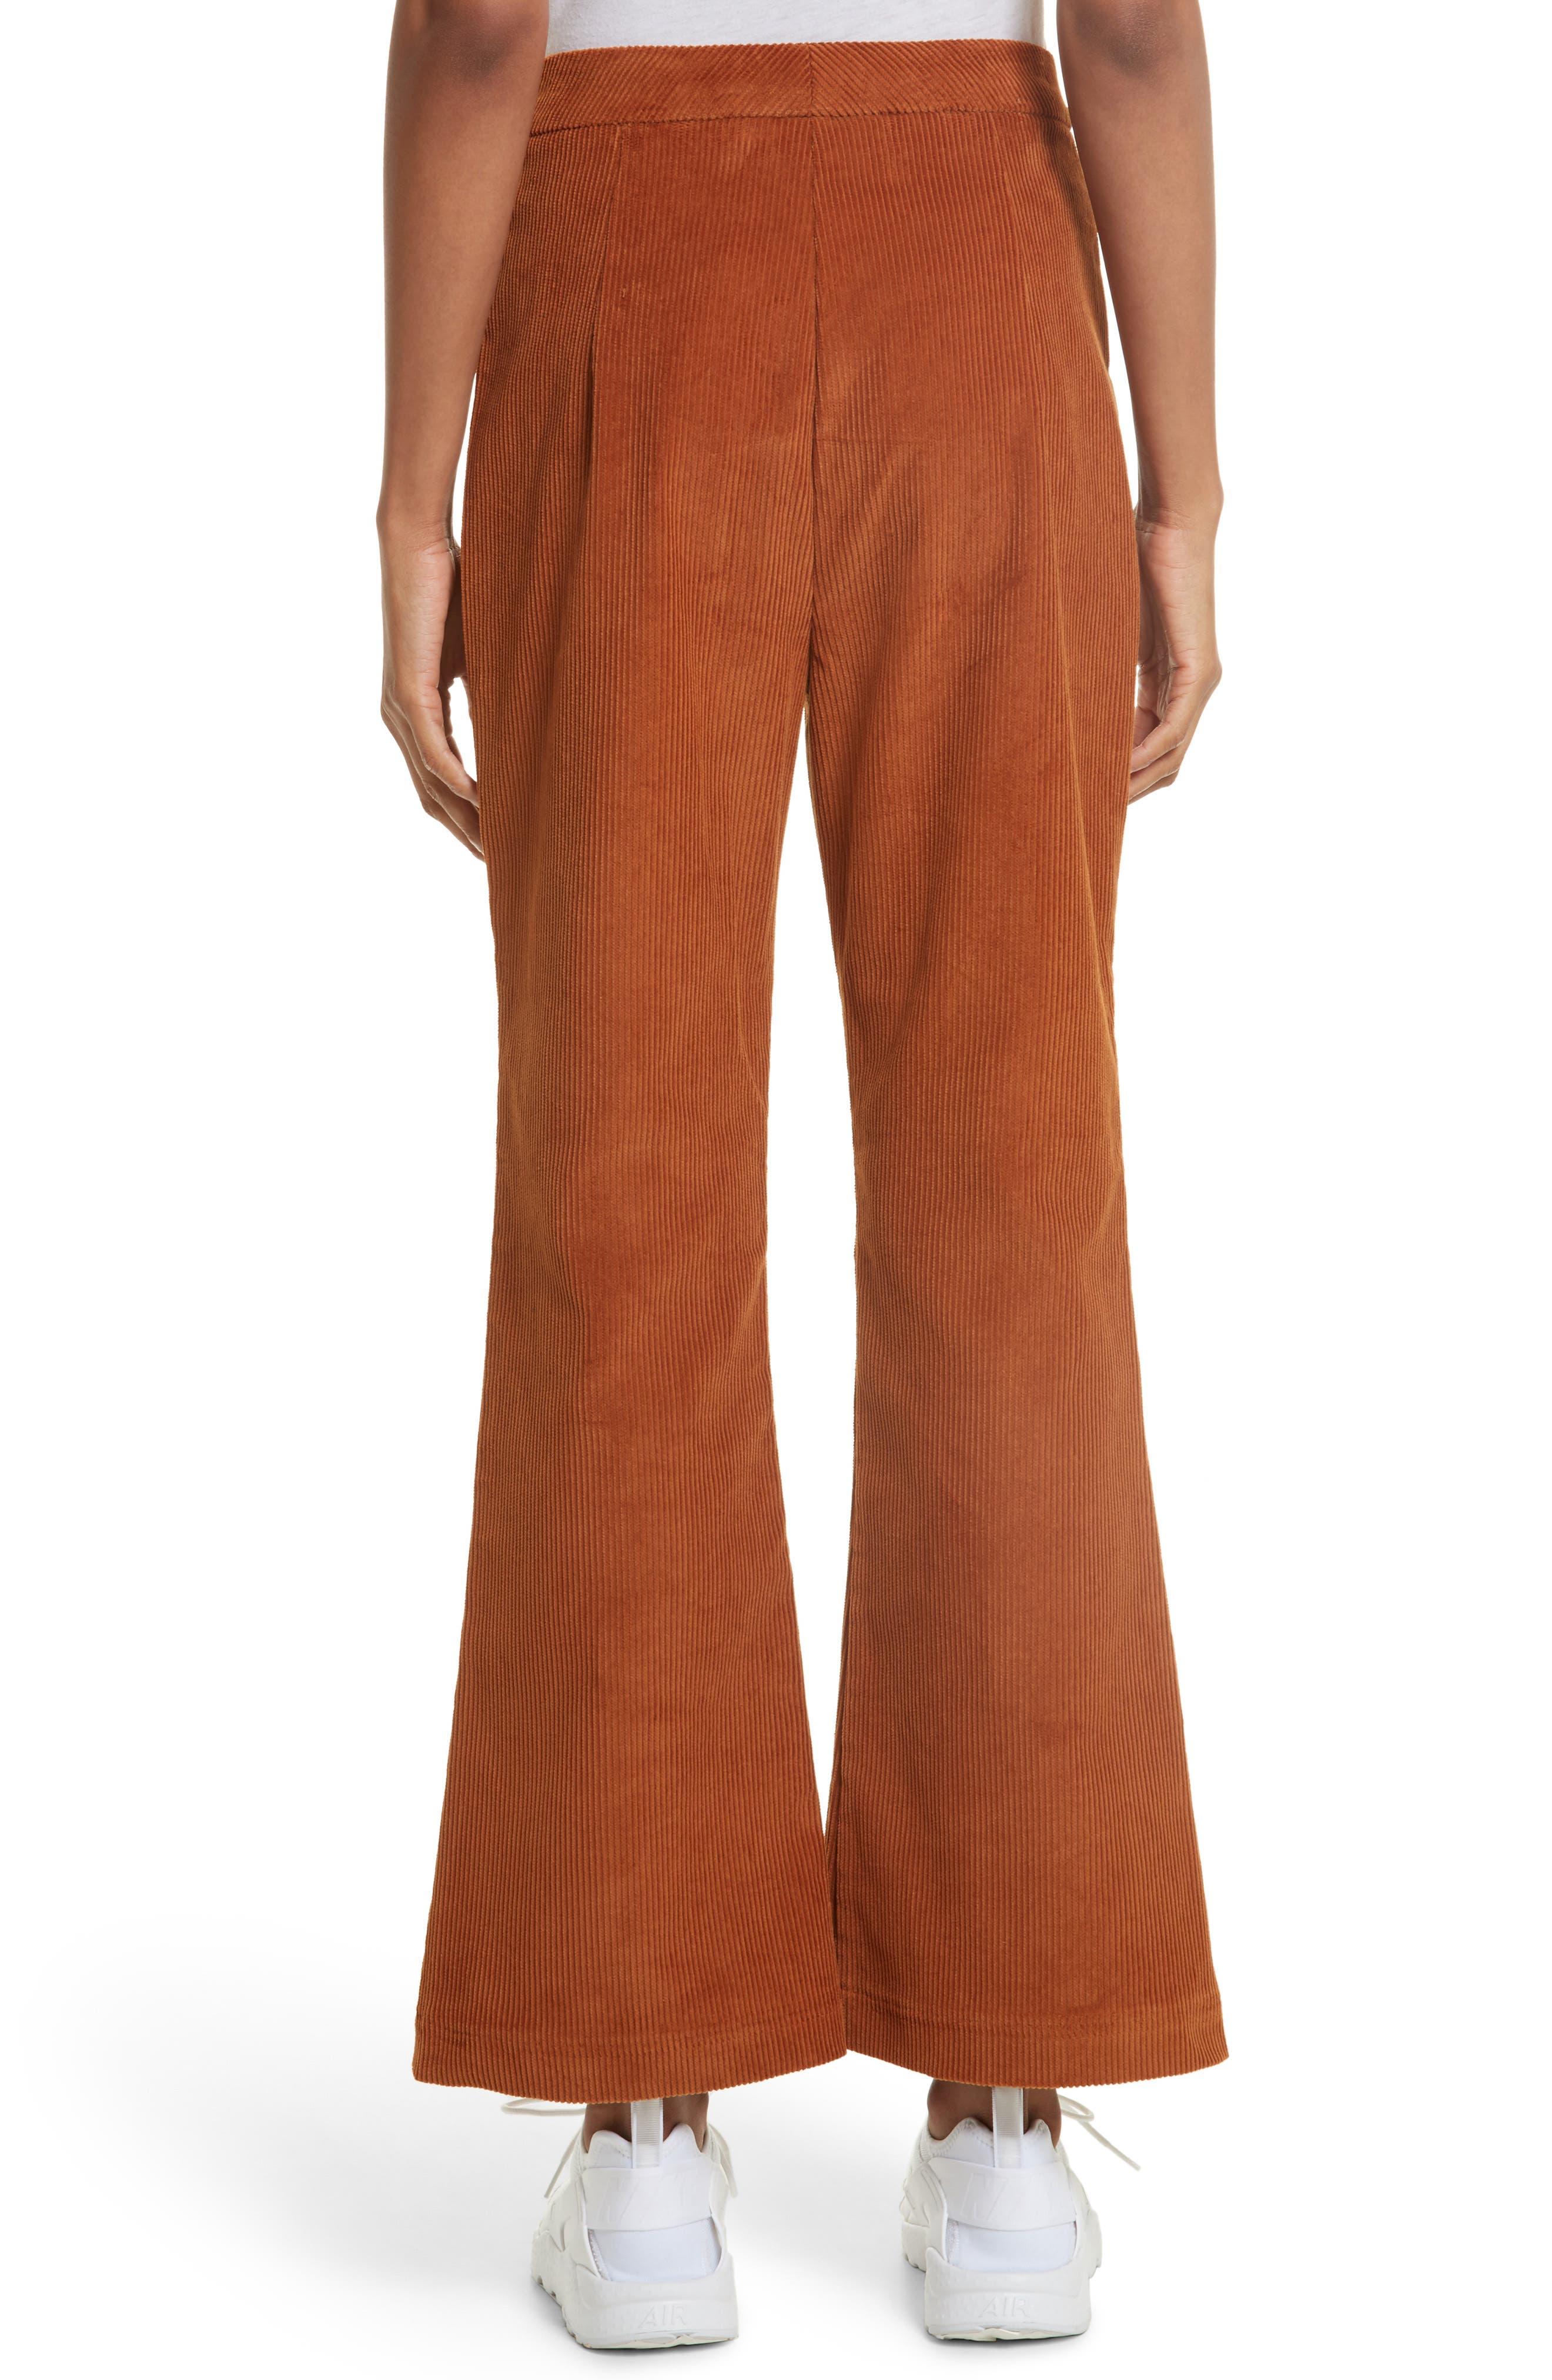 Crop Flare Corduroy Trousers,                             Alternate thumbnail 2, color,                             200